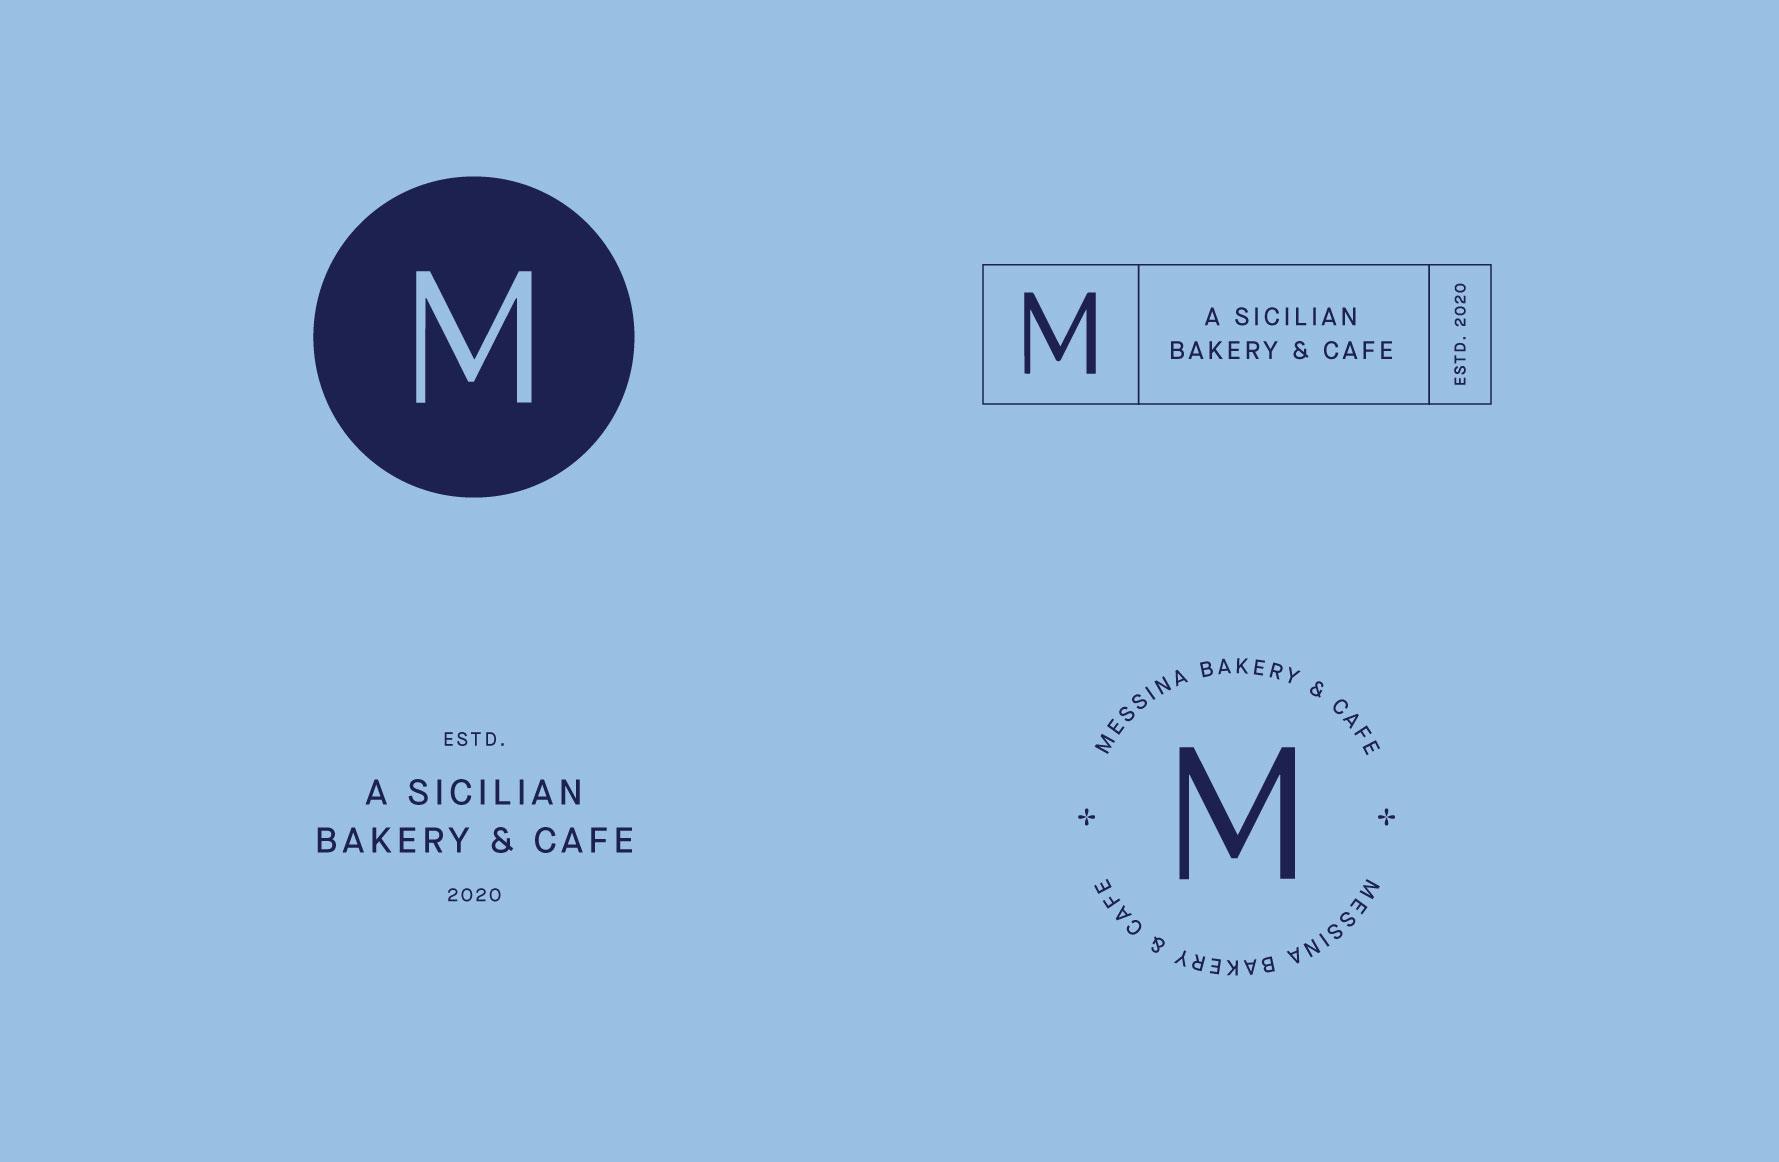 Messina Brand Marks